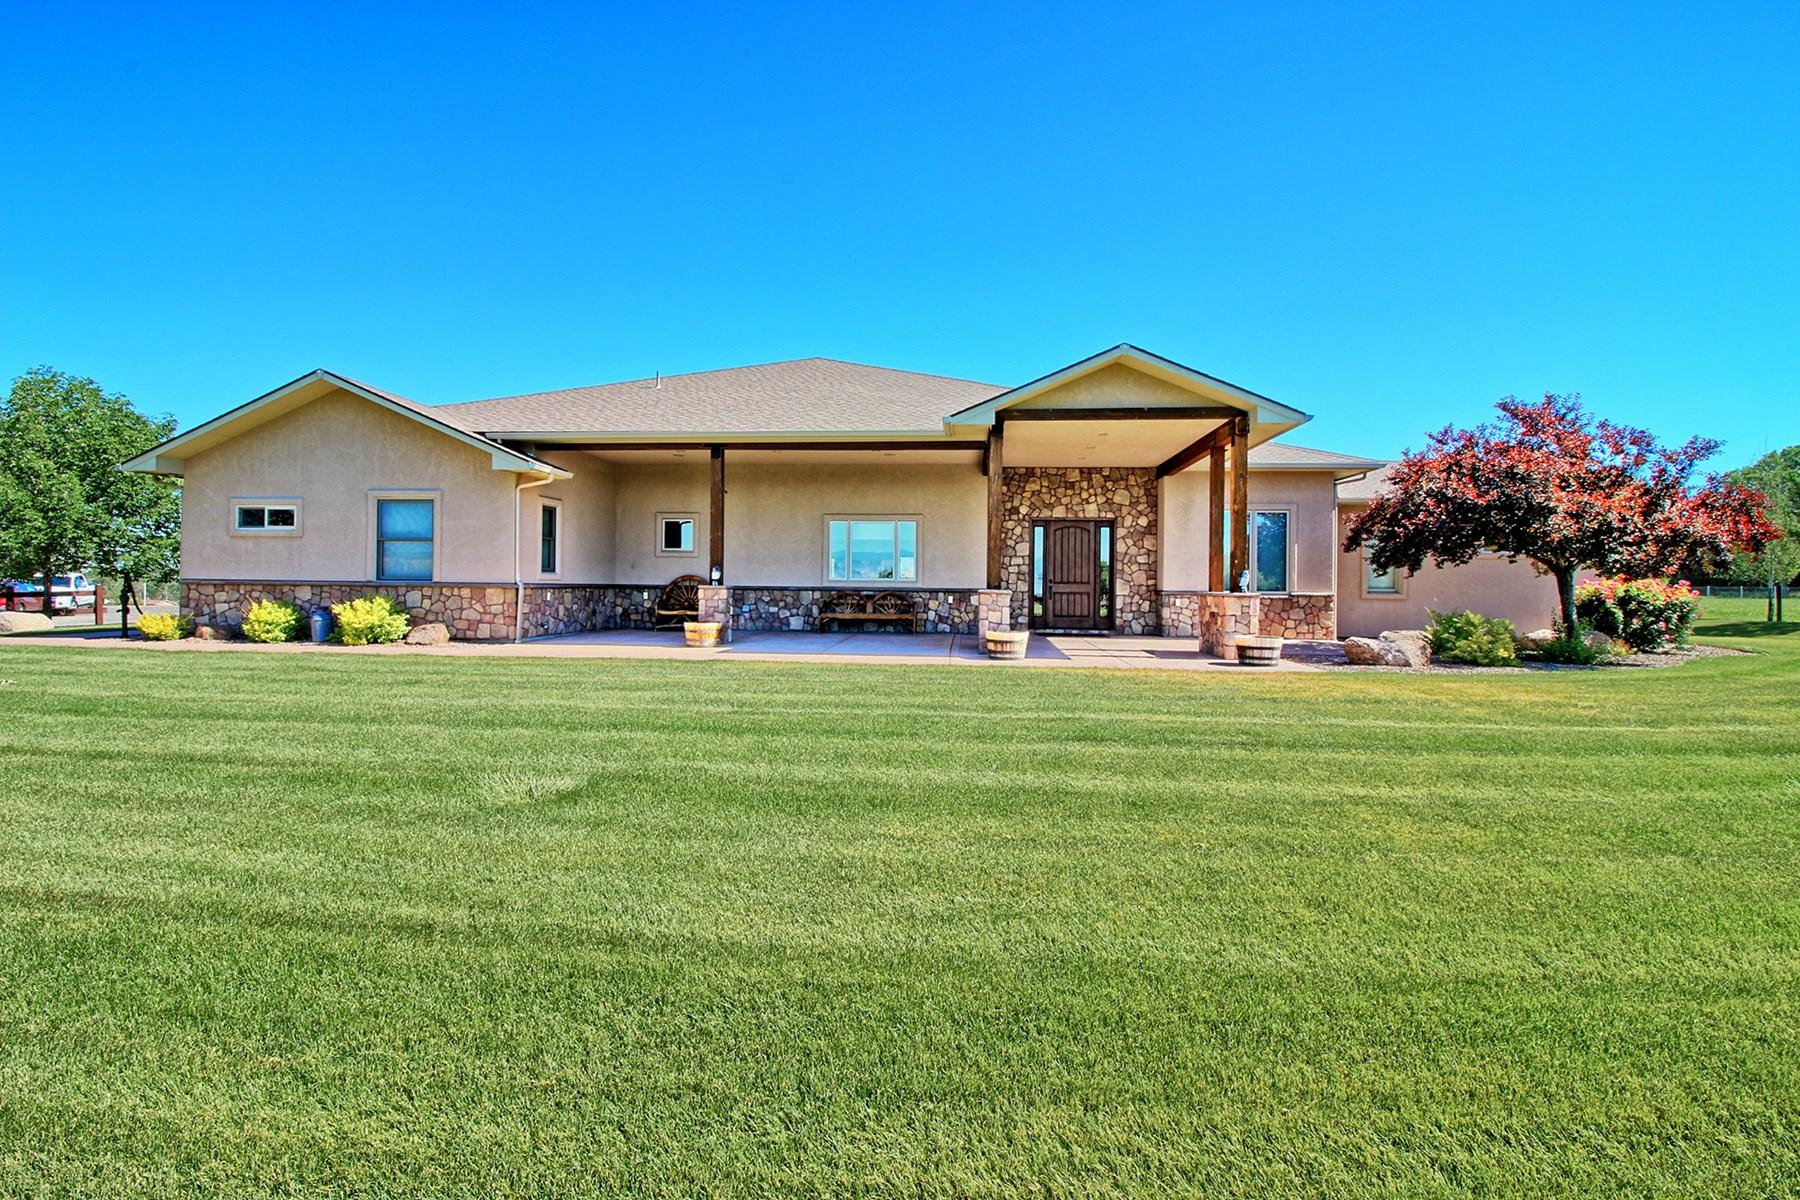 Colorado Luxury Ranch Home for Sale